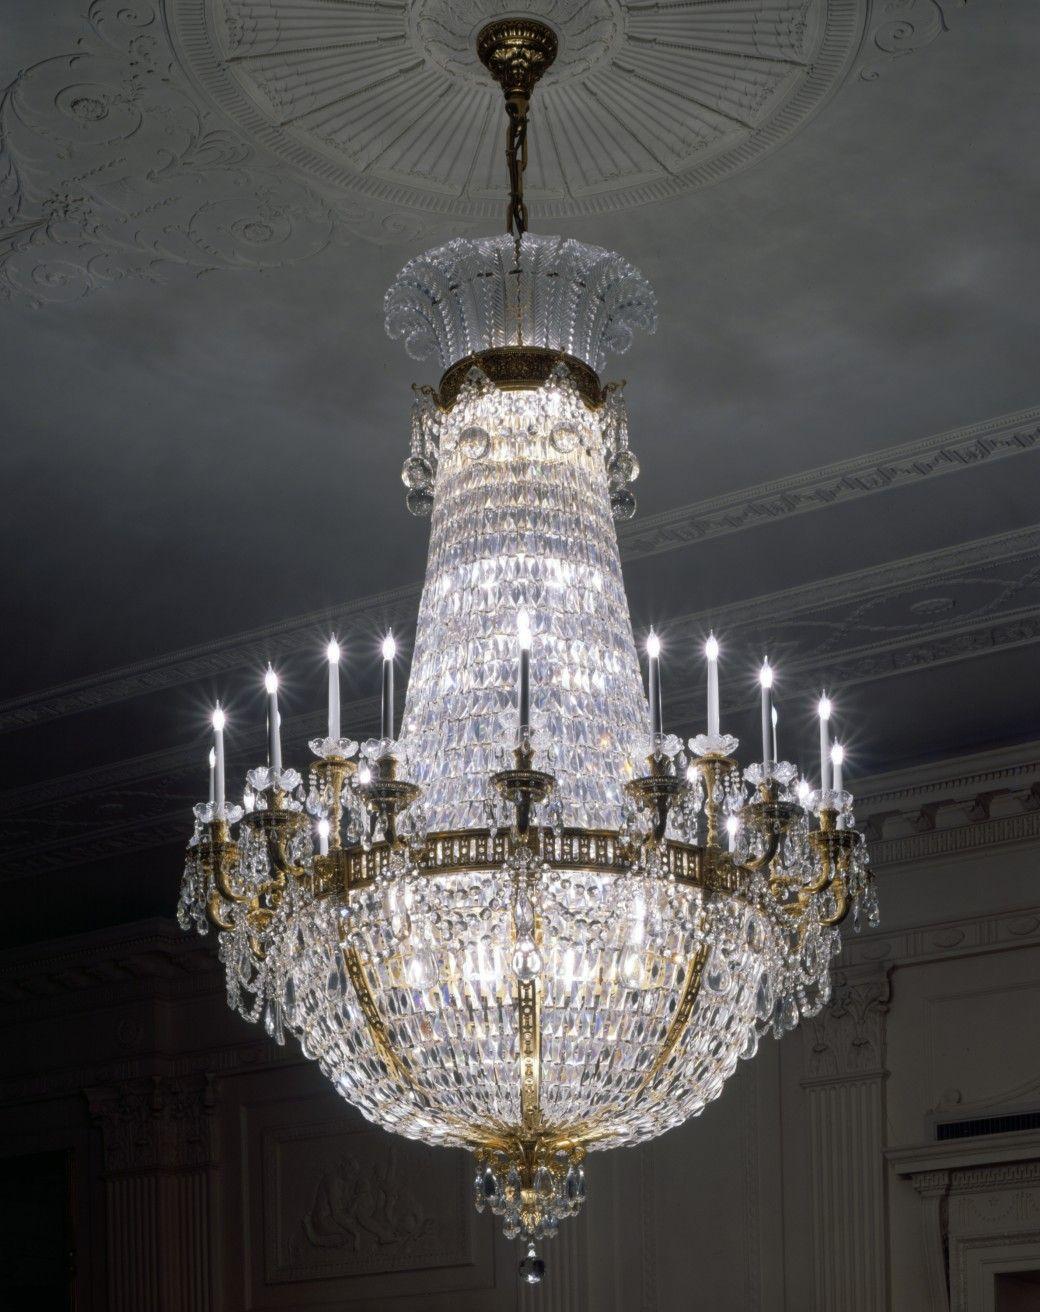 White house washington dc three floor second floor brass chandelier crystal chandeliers